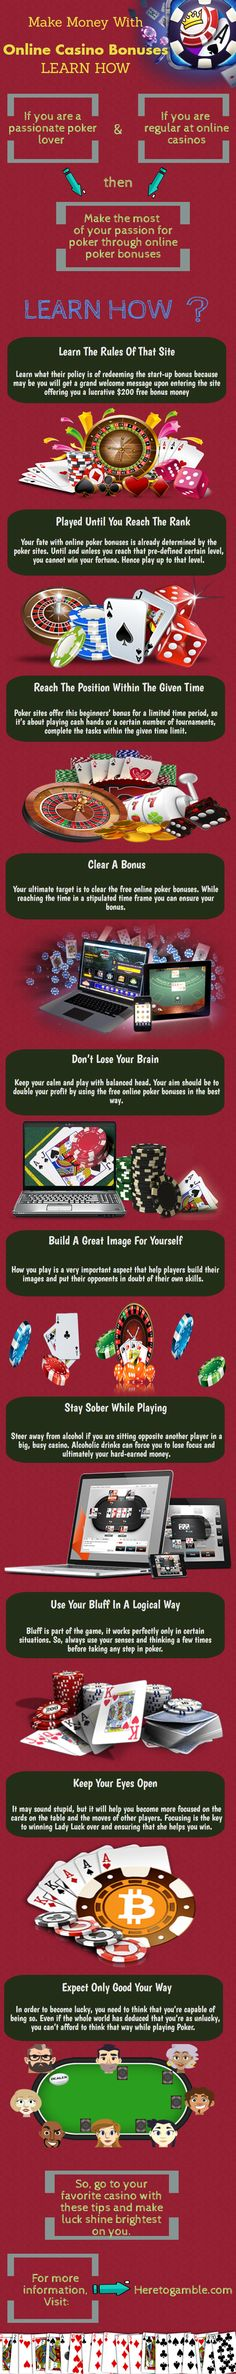 Www.geheime-casino-tricks.de